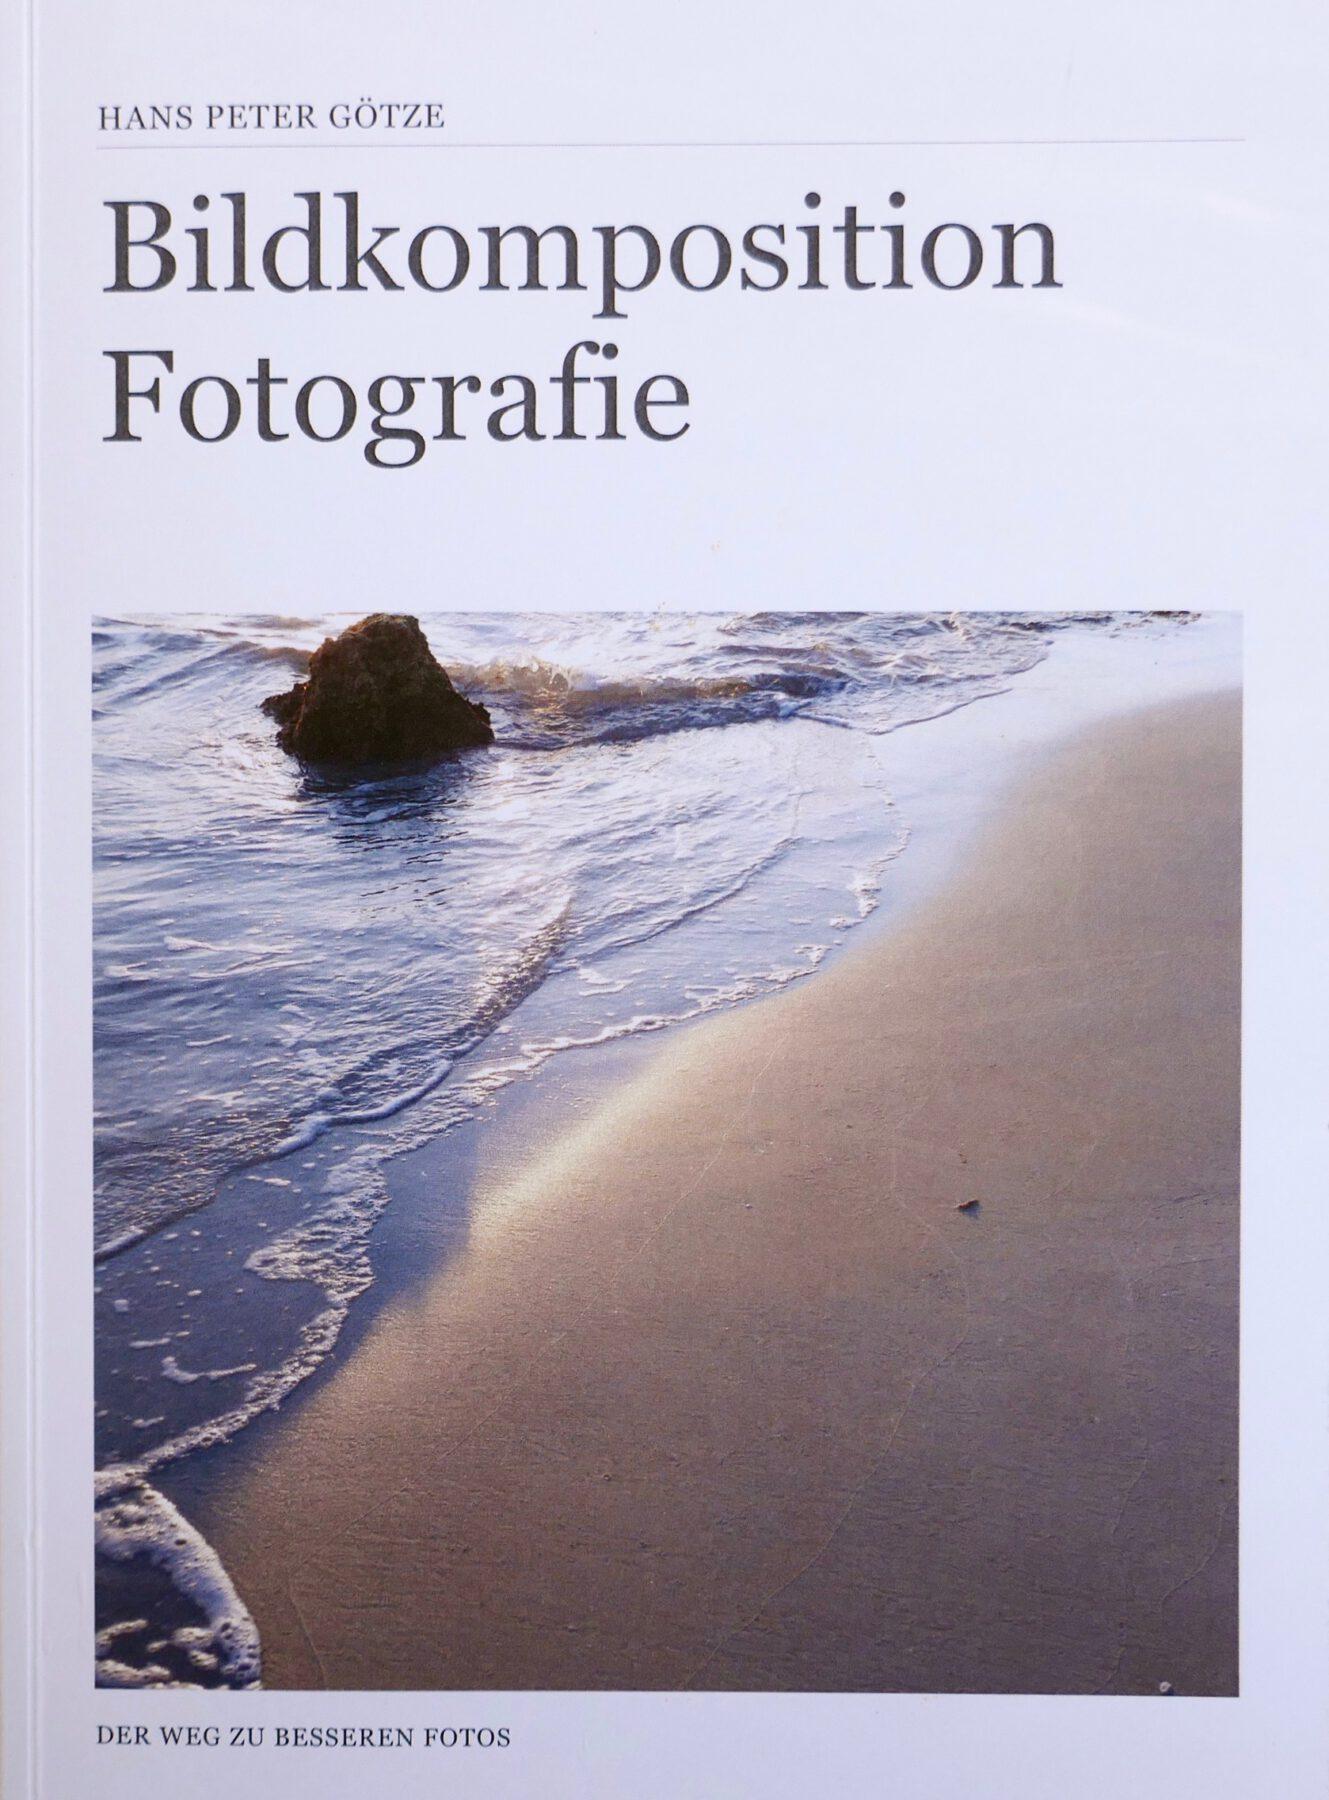 Hans Peter Götze: Bildkomposition Fotografie